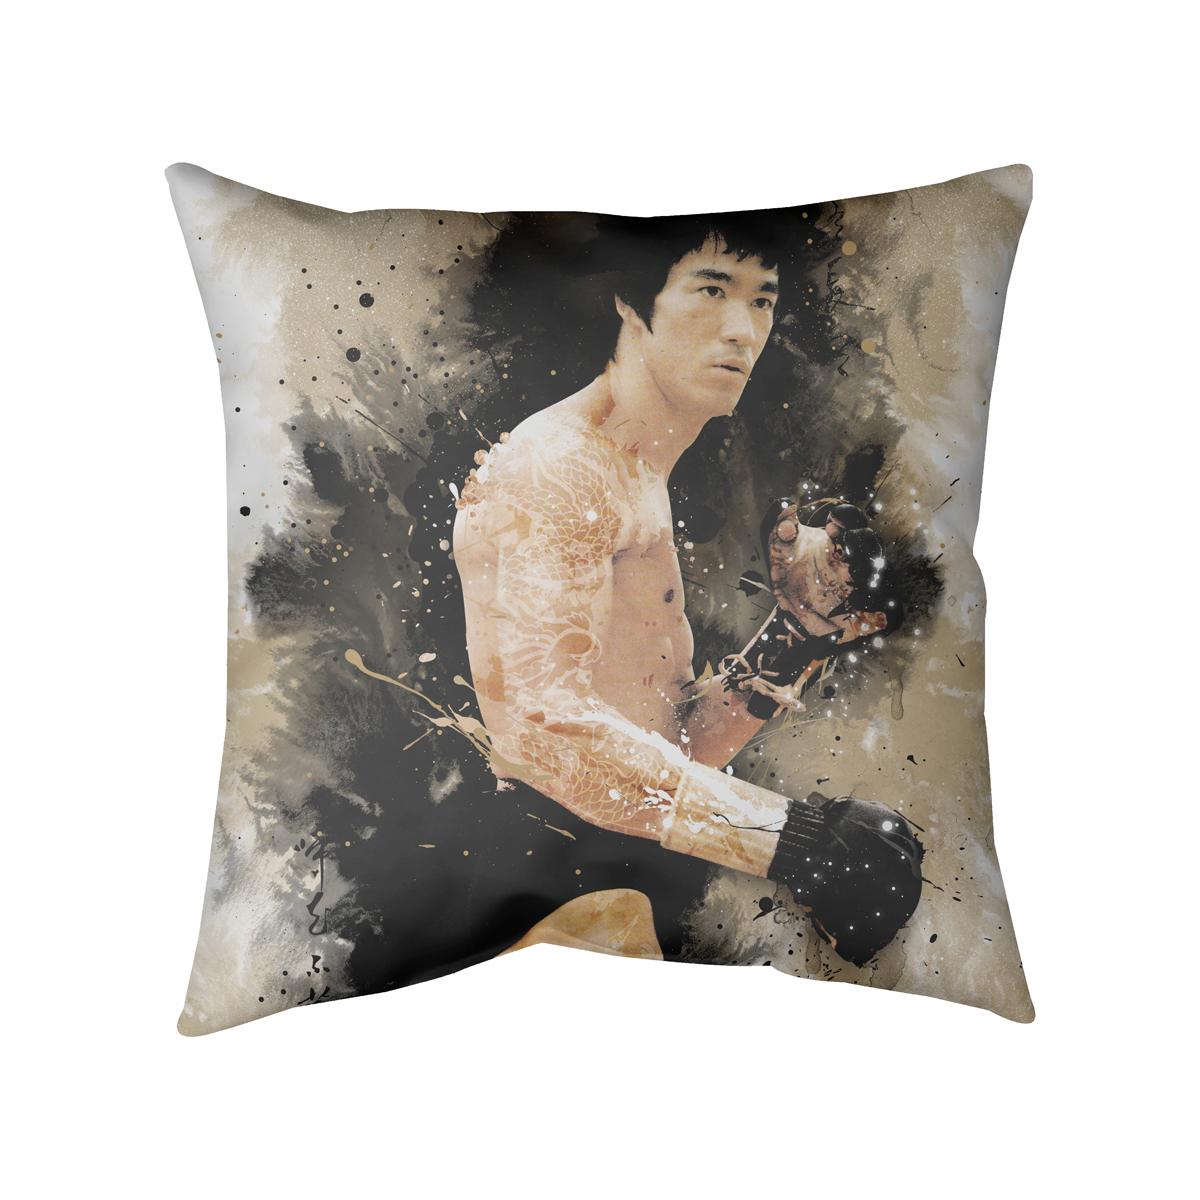 Dragon Story Decorative Pillow